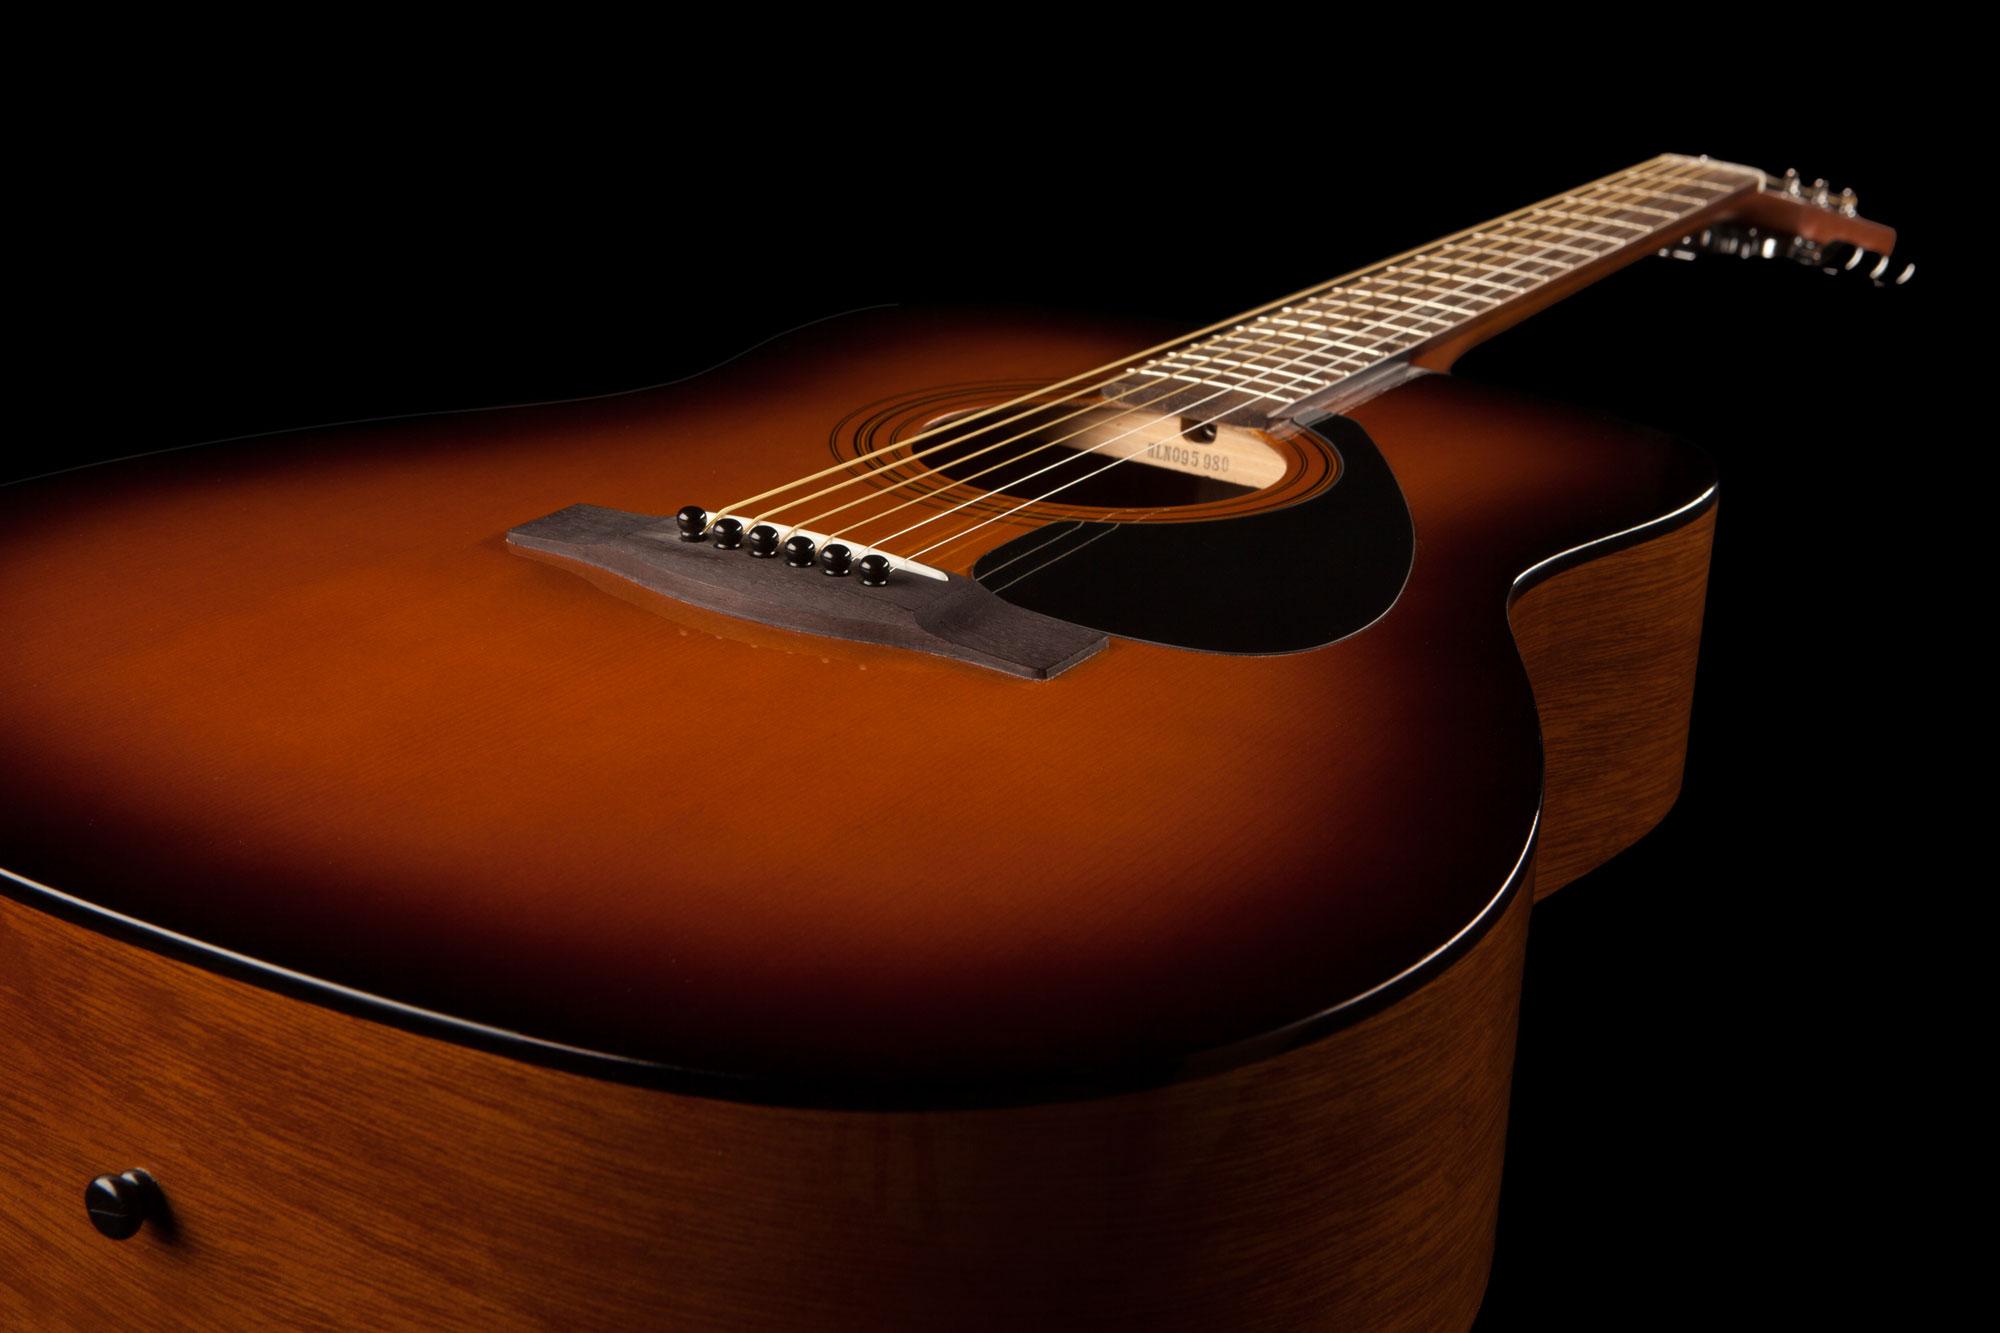 81cf1b1301e Yamaha F310 Acoustic Guitar In Tobacco Brown Sunburst finish ...